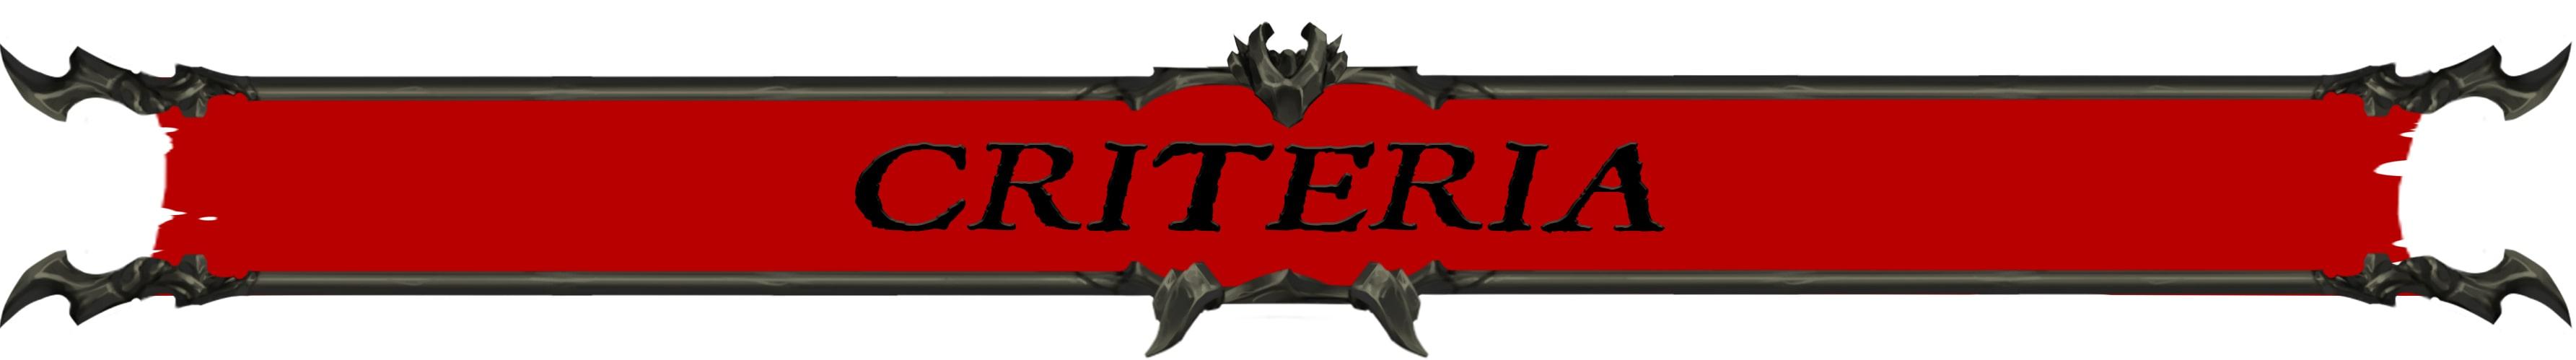 Criteria Banner